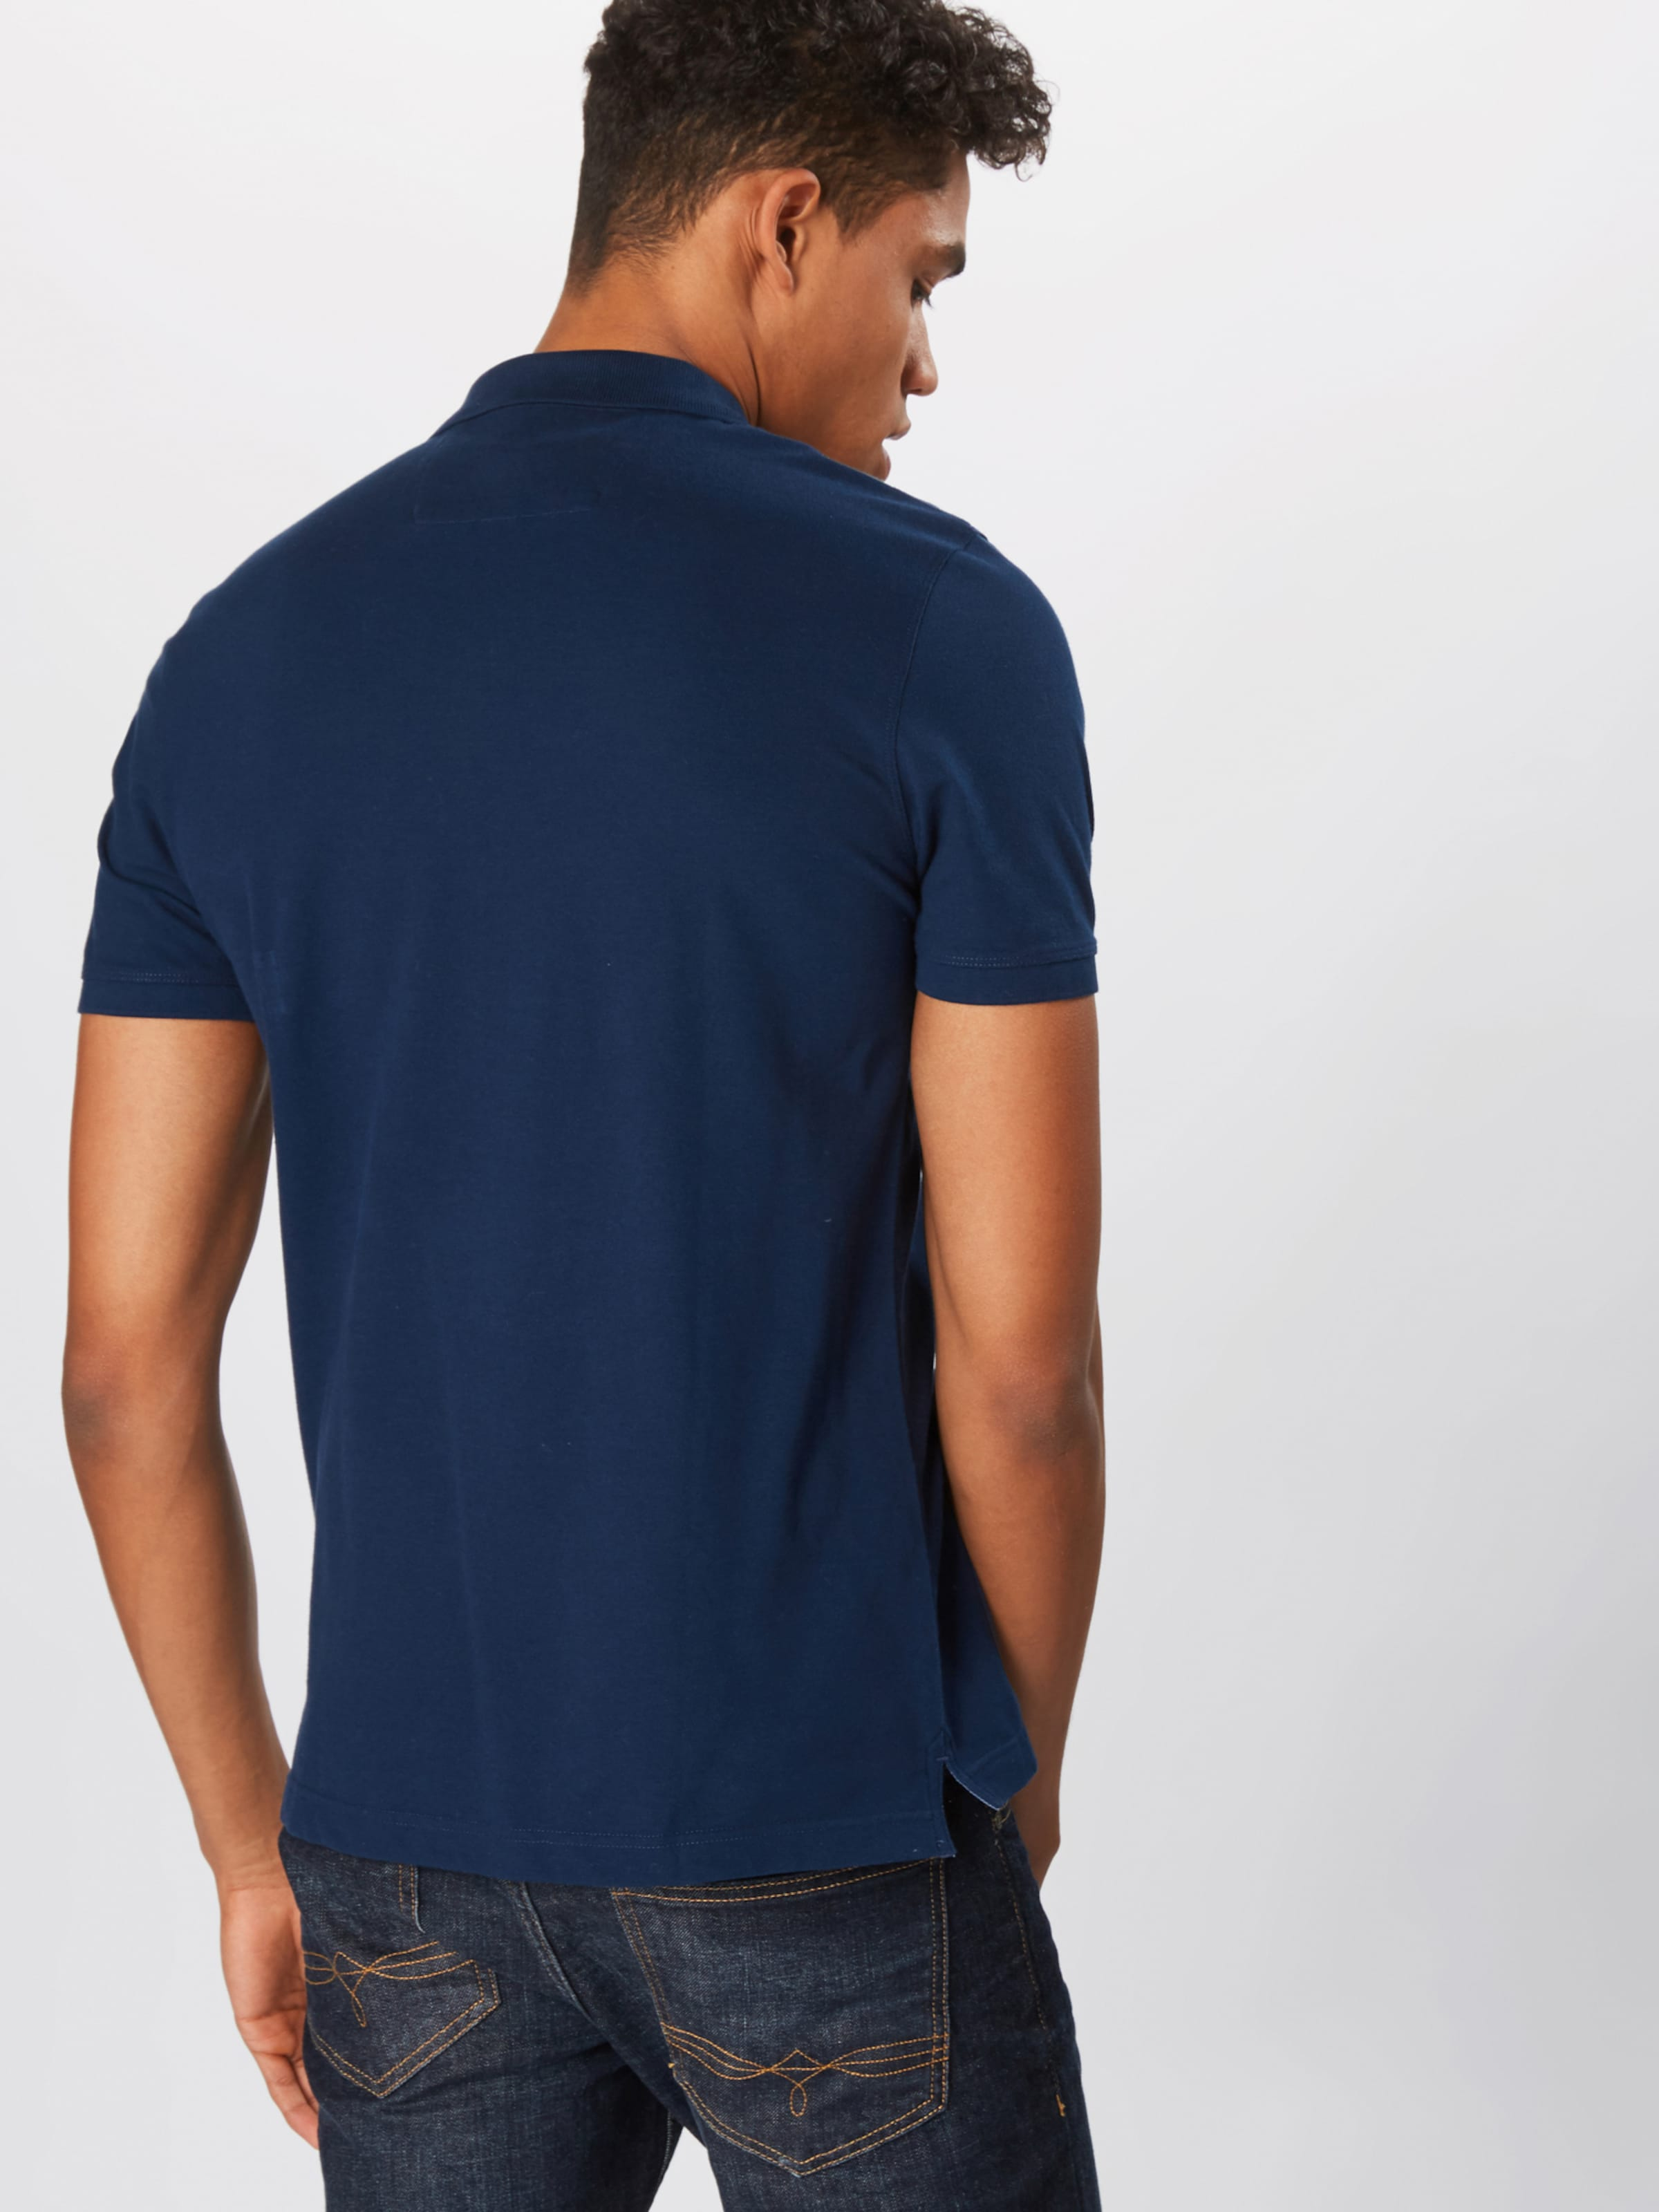 shirt Branded Basics' Pique T Banana Marine 'st Republic Bleu En Polo WIDE29H